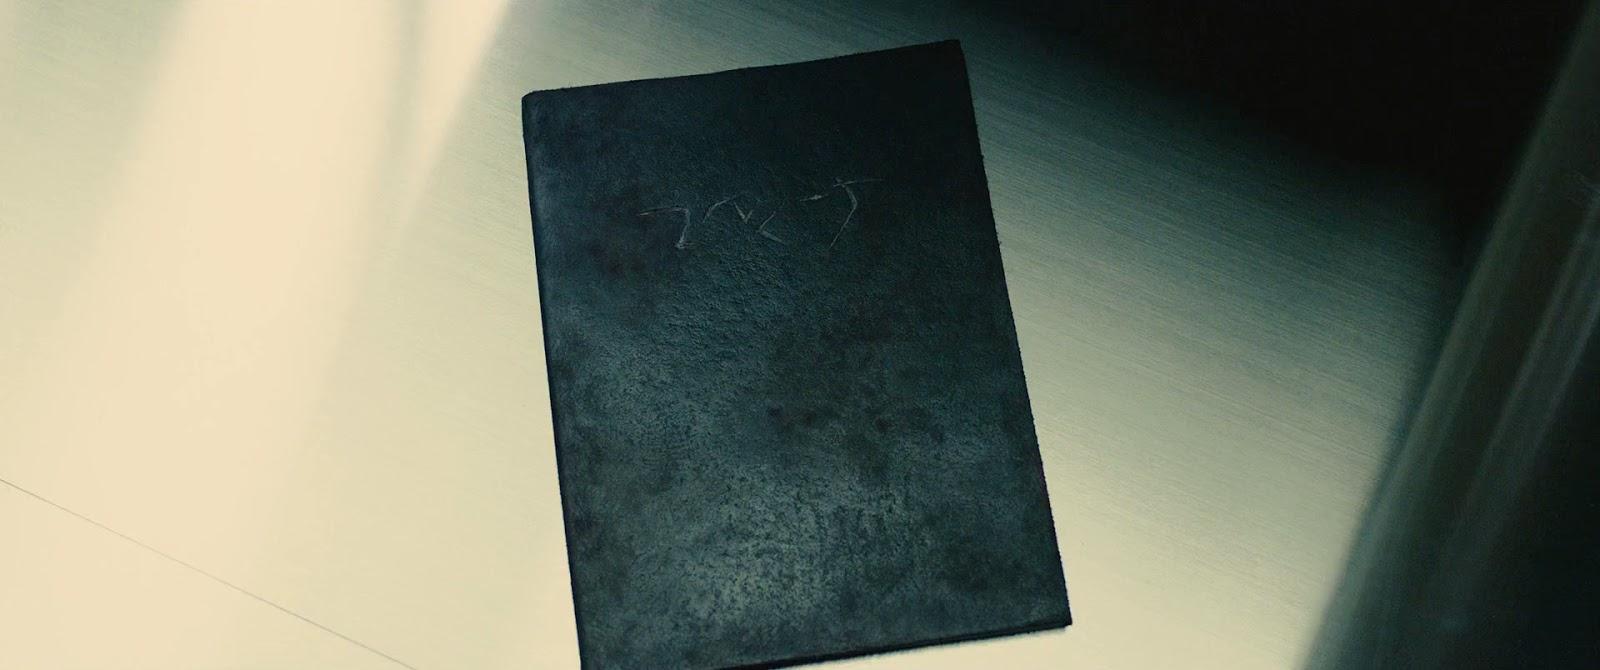 Death Note Light Up the New World (2016) HD 1080p Japones Sub Español captura 1